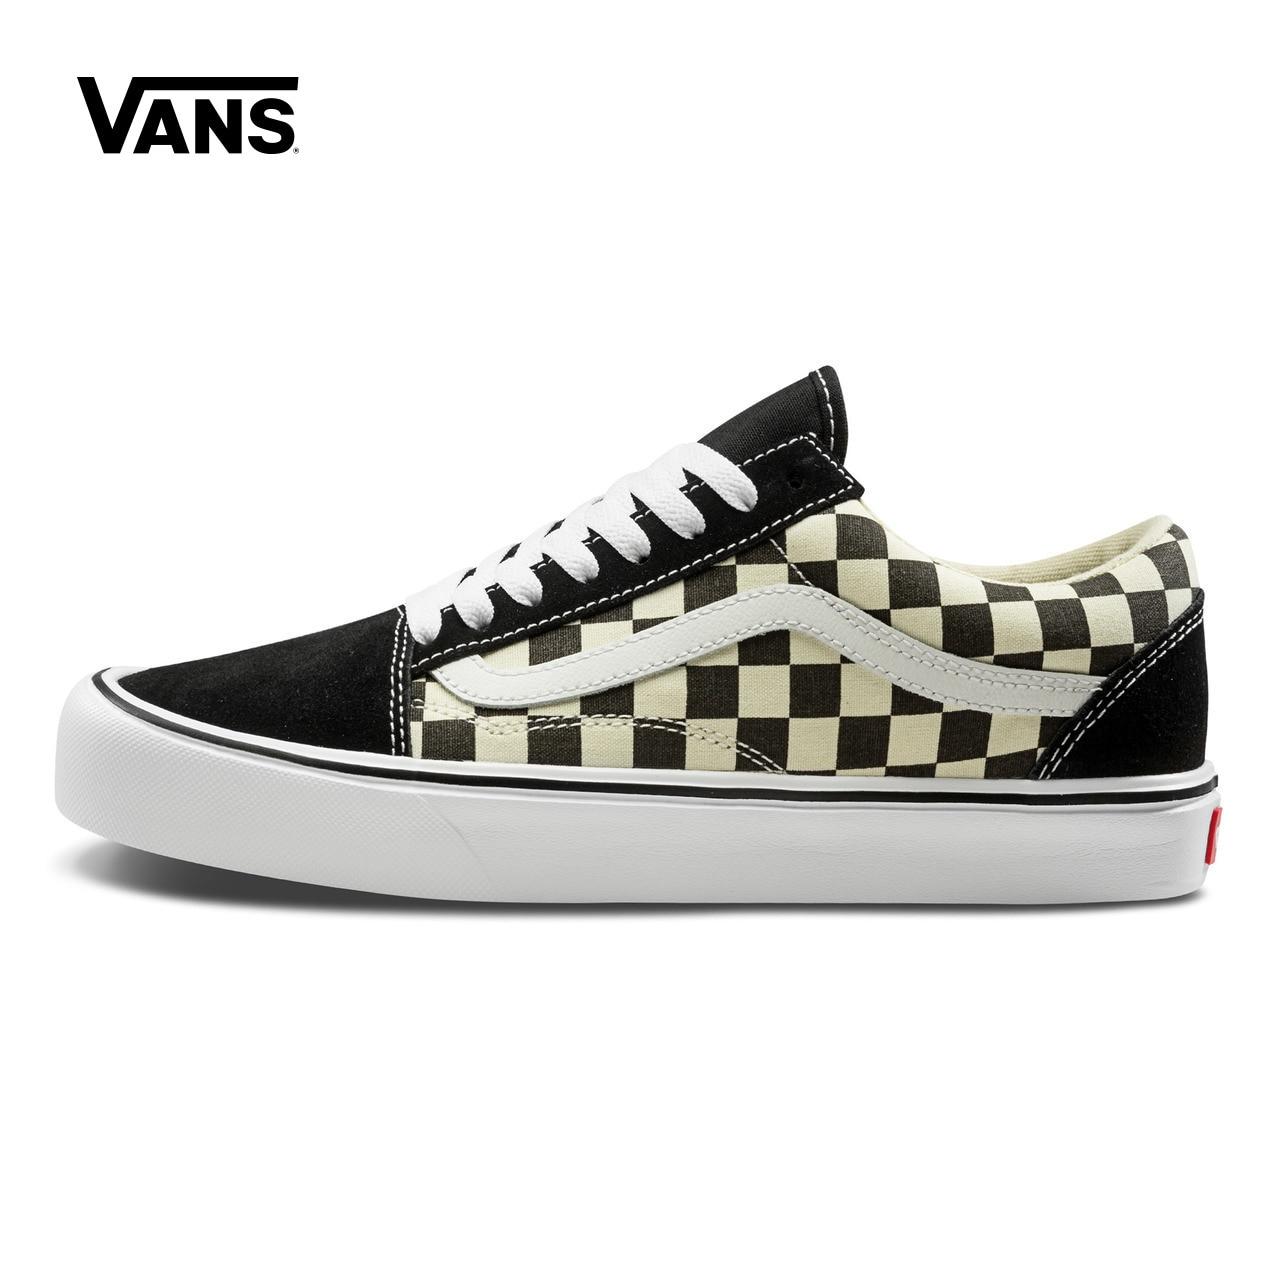 Original New Arrival Vans Men s   Women s Classic Old Skool Lite Skateboarding  Shoes Sport Outdoor Sneakers 3199fee95